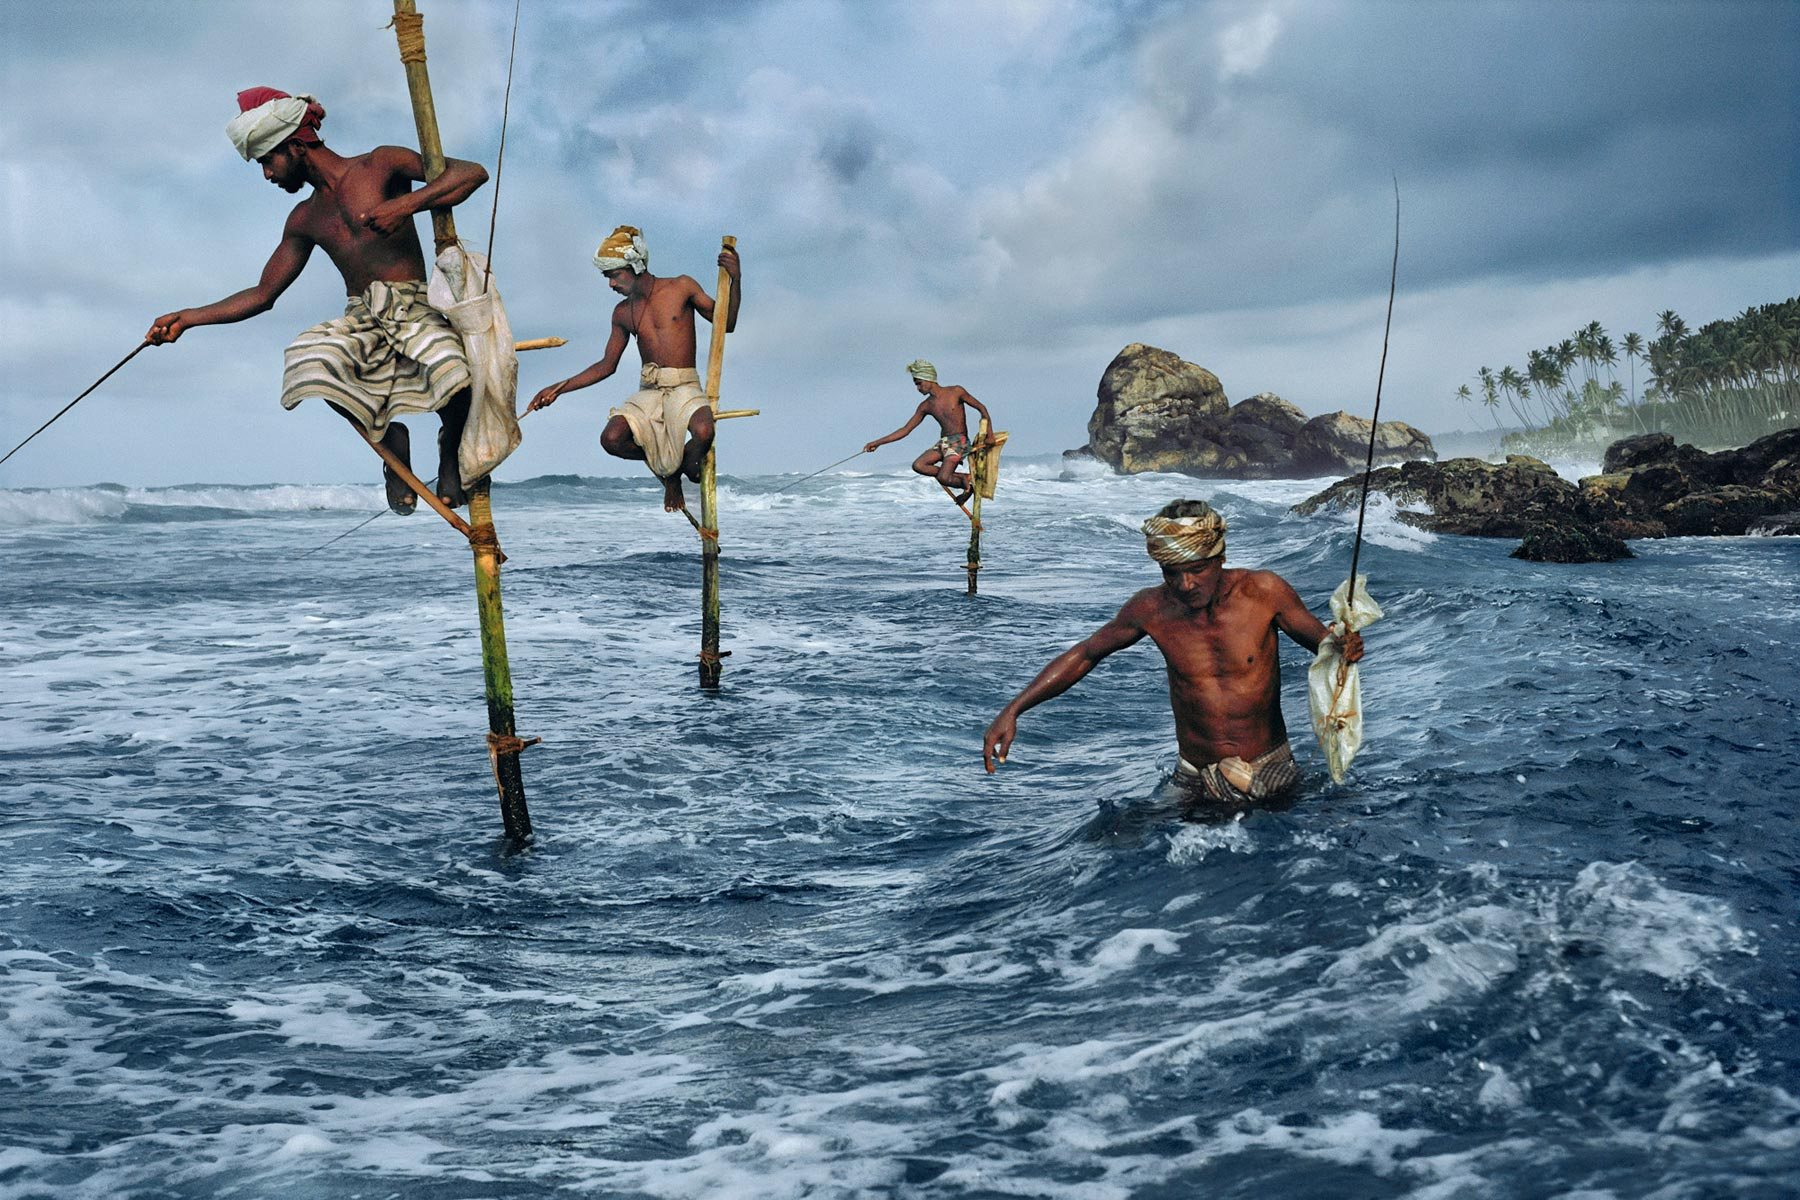 Steve McCurry, Weligama, Sri Lanka, 1995. © Steve McCurry